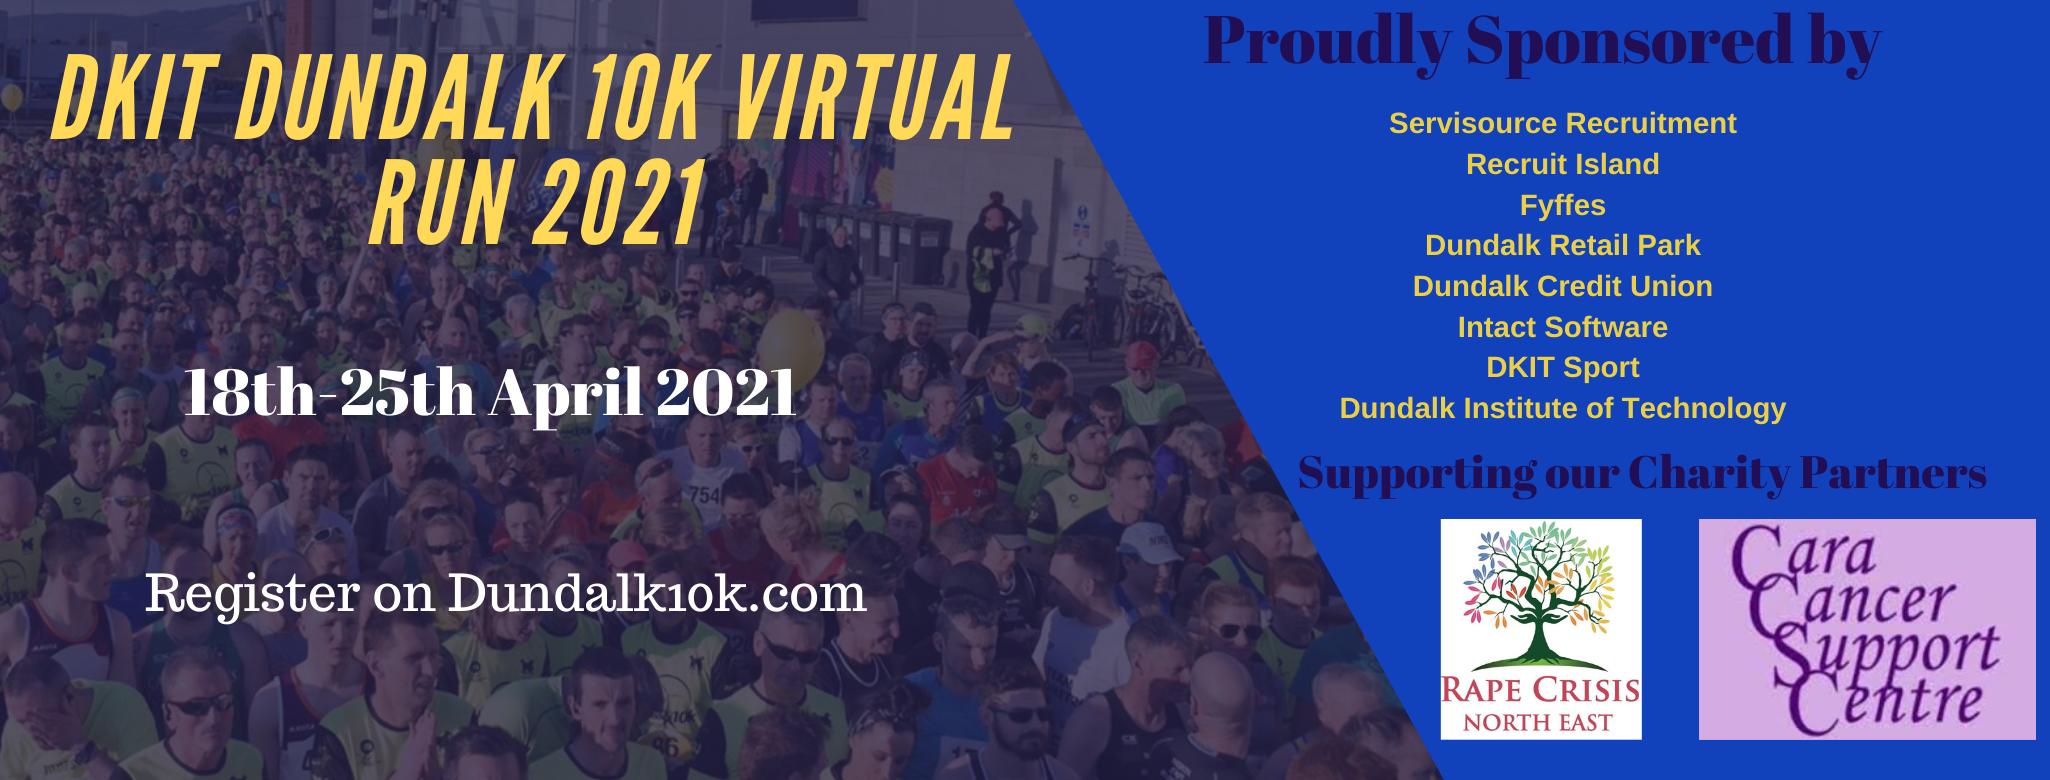 DkIT Dundalk 10k Virtual Run